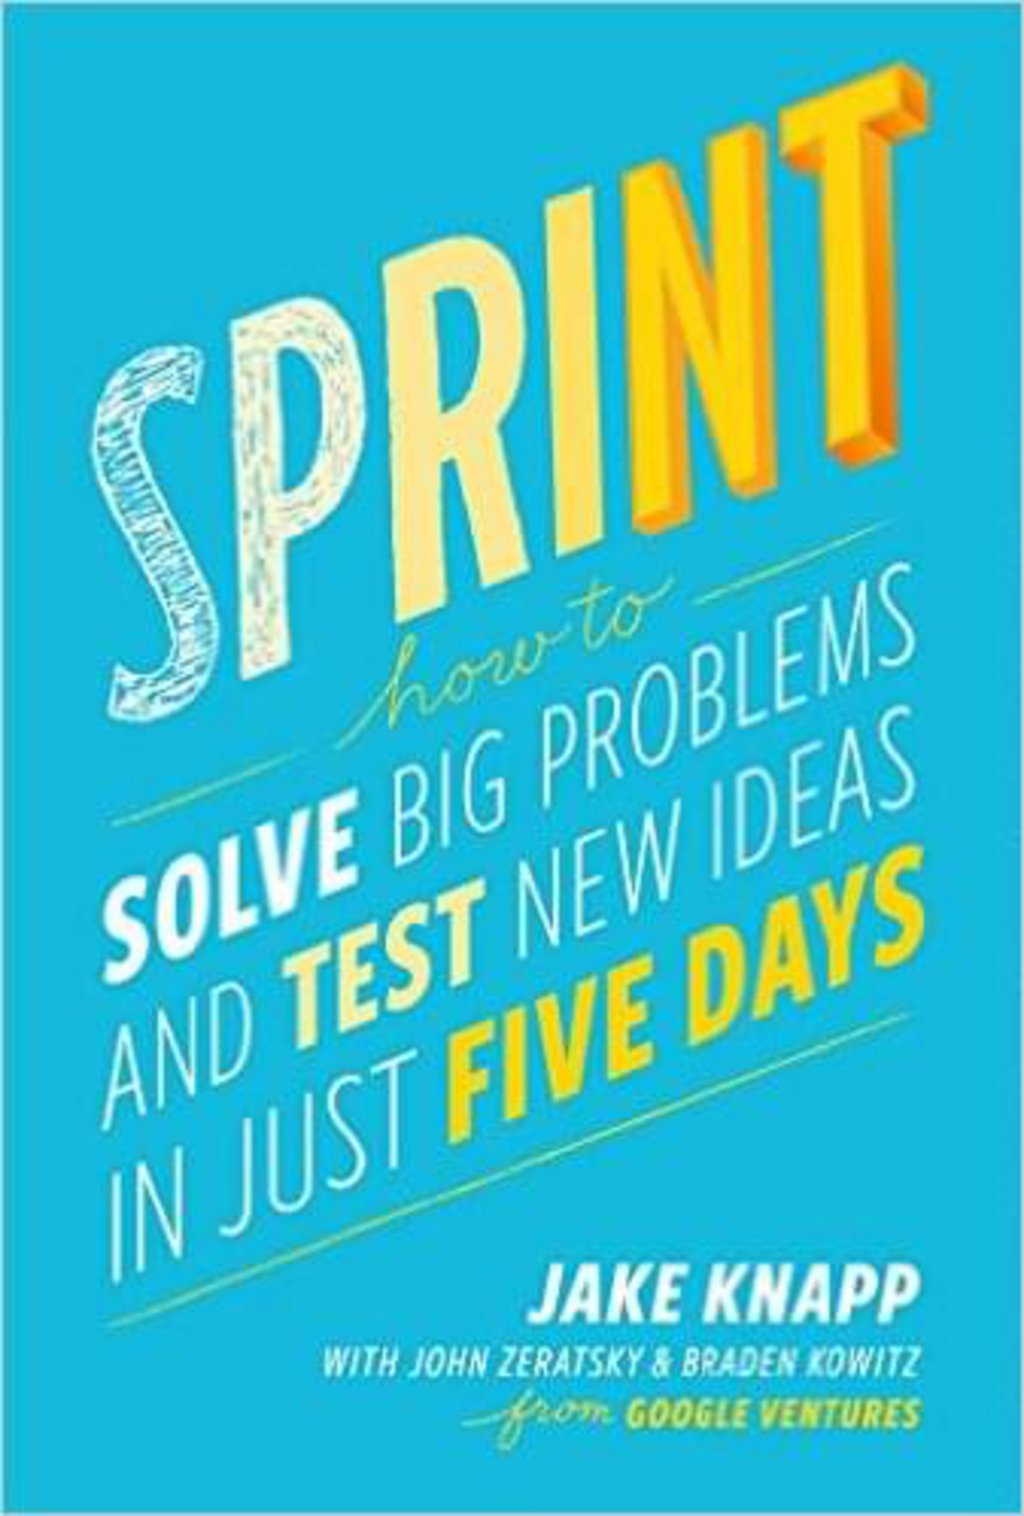 Sprint google venture